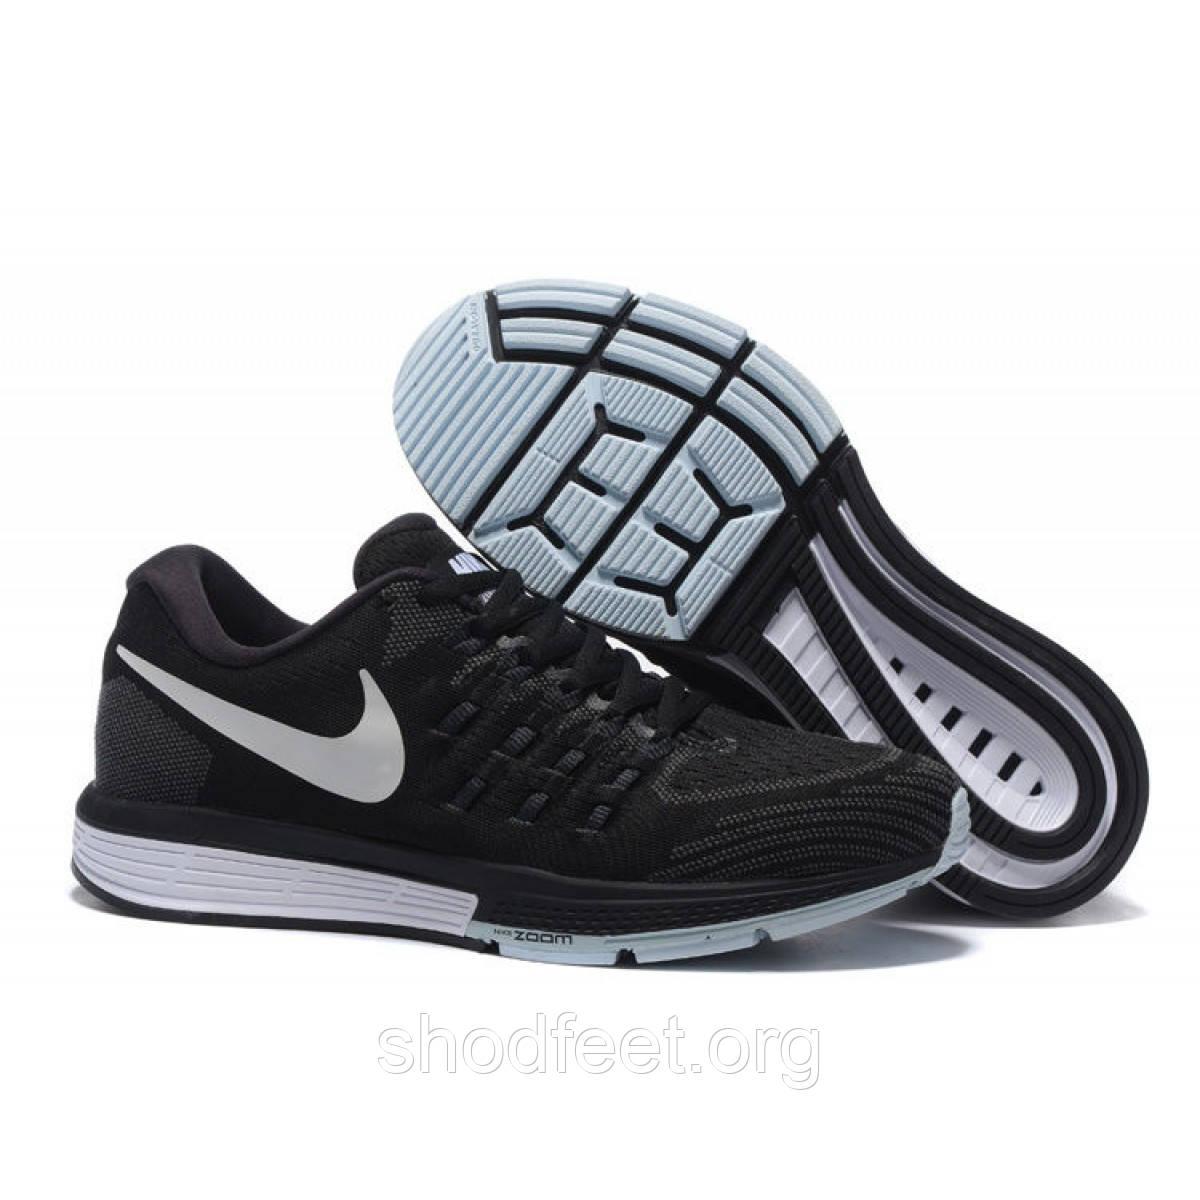 Мужские кроссовки Nike Air Zoom Vomero 11 Black